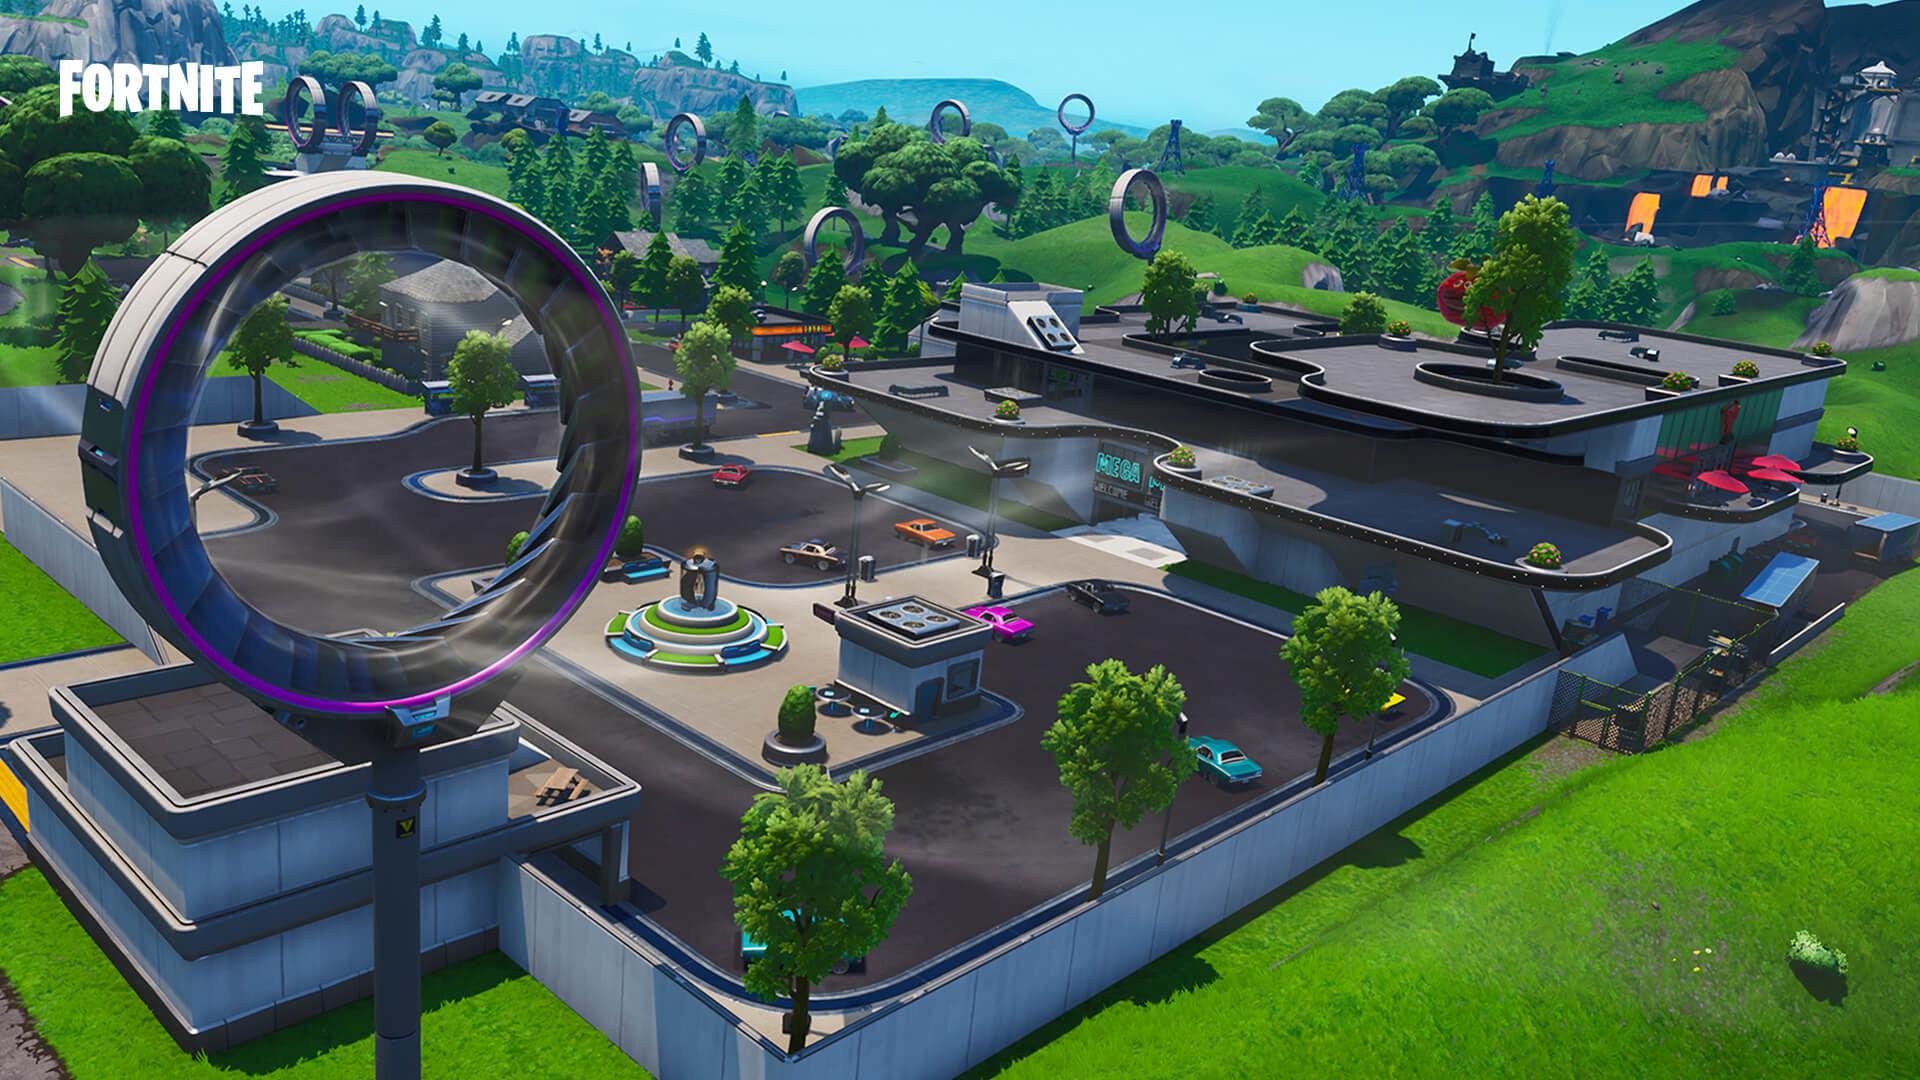 Fortnite saison 9 : changements de carte Fortnite Mega Mall